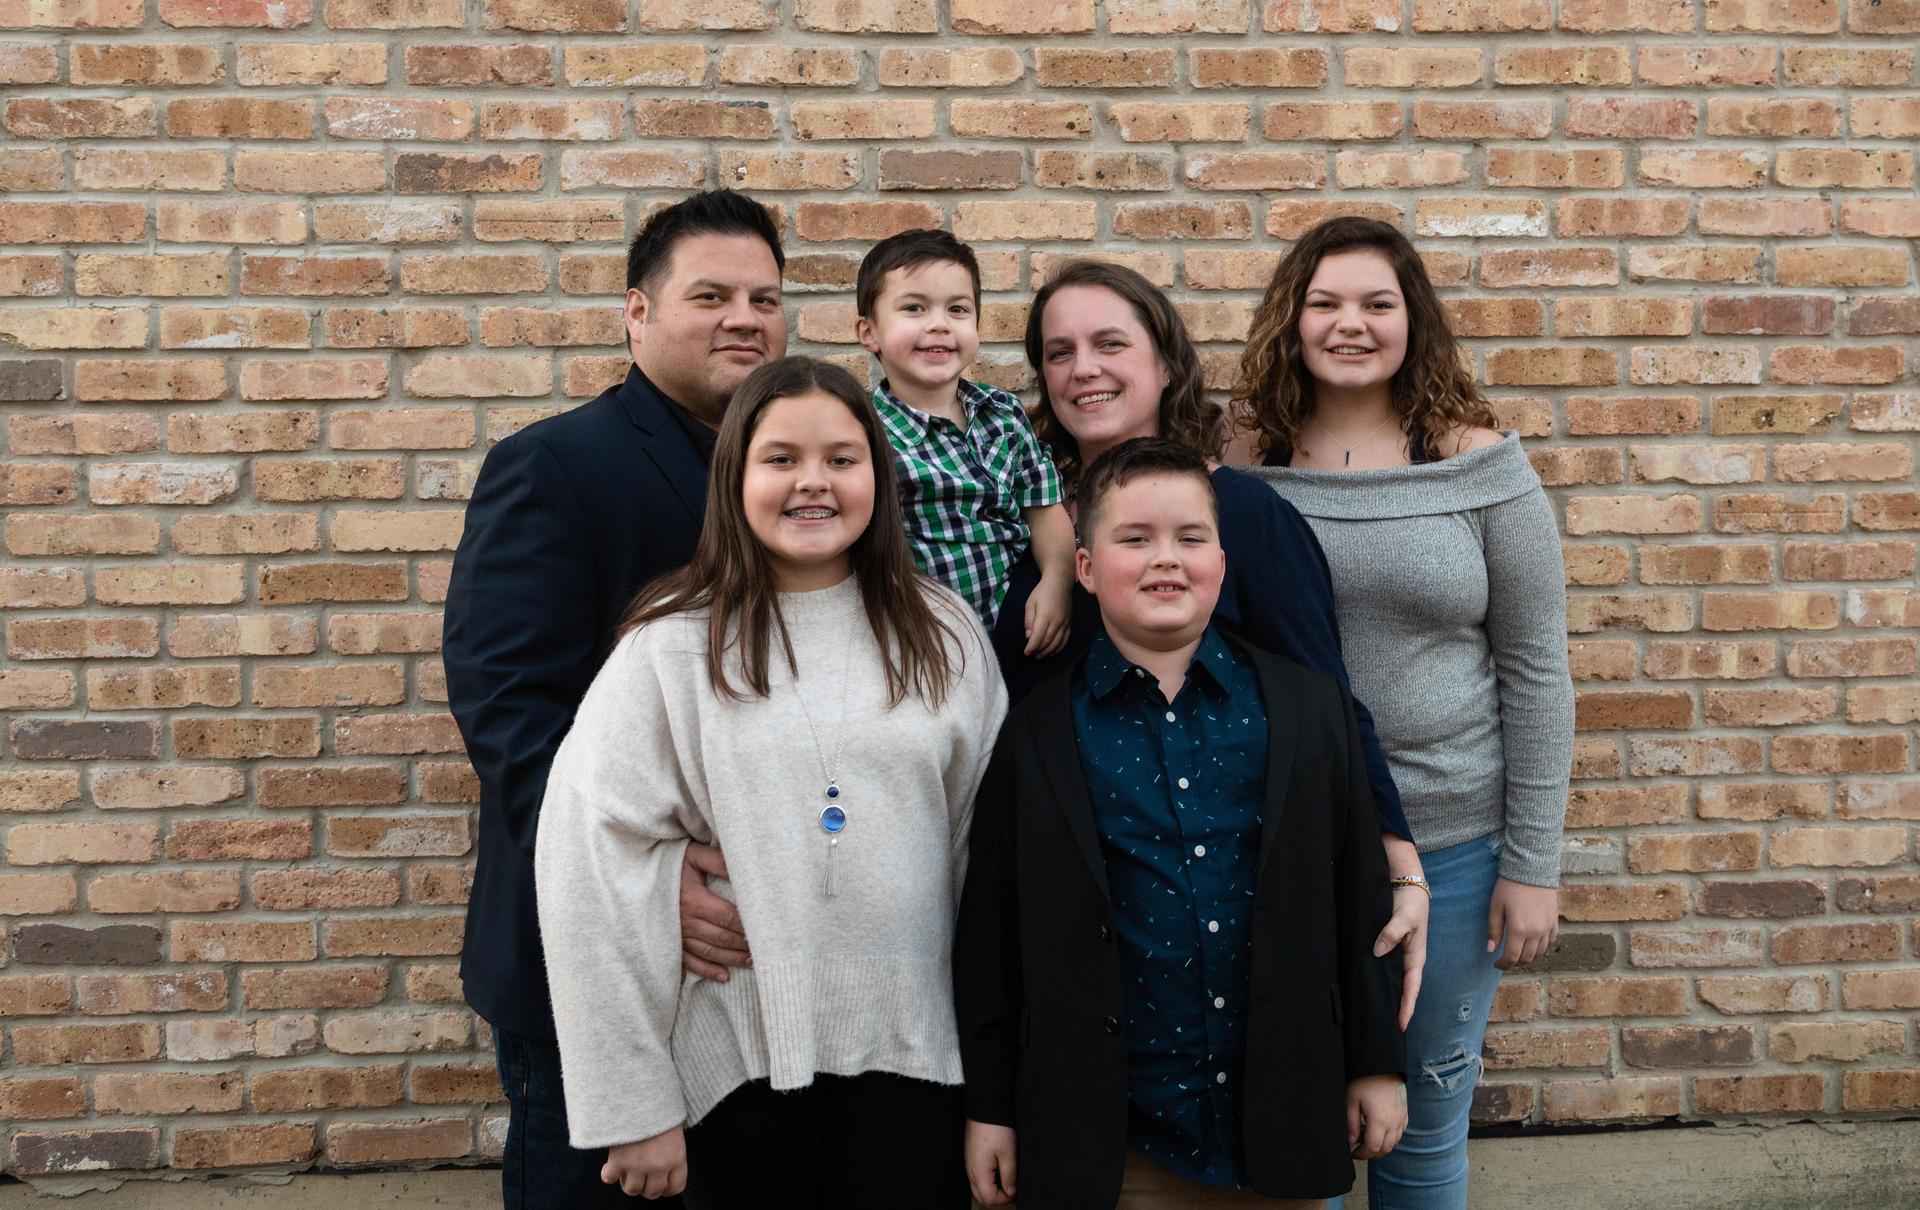 Chapa Family